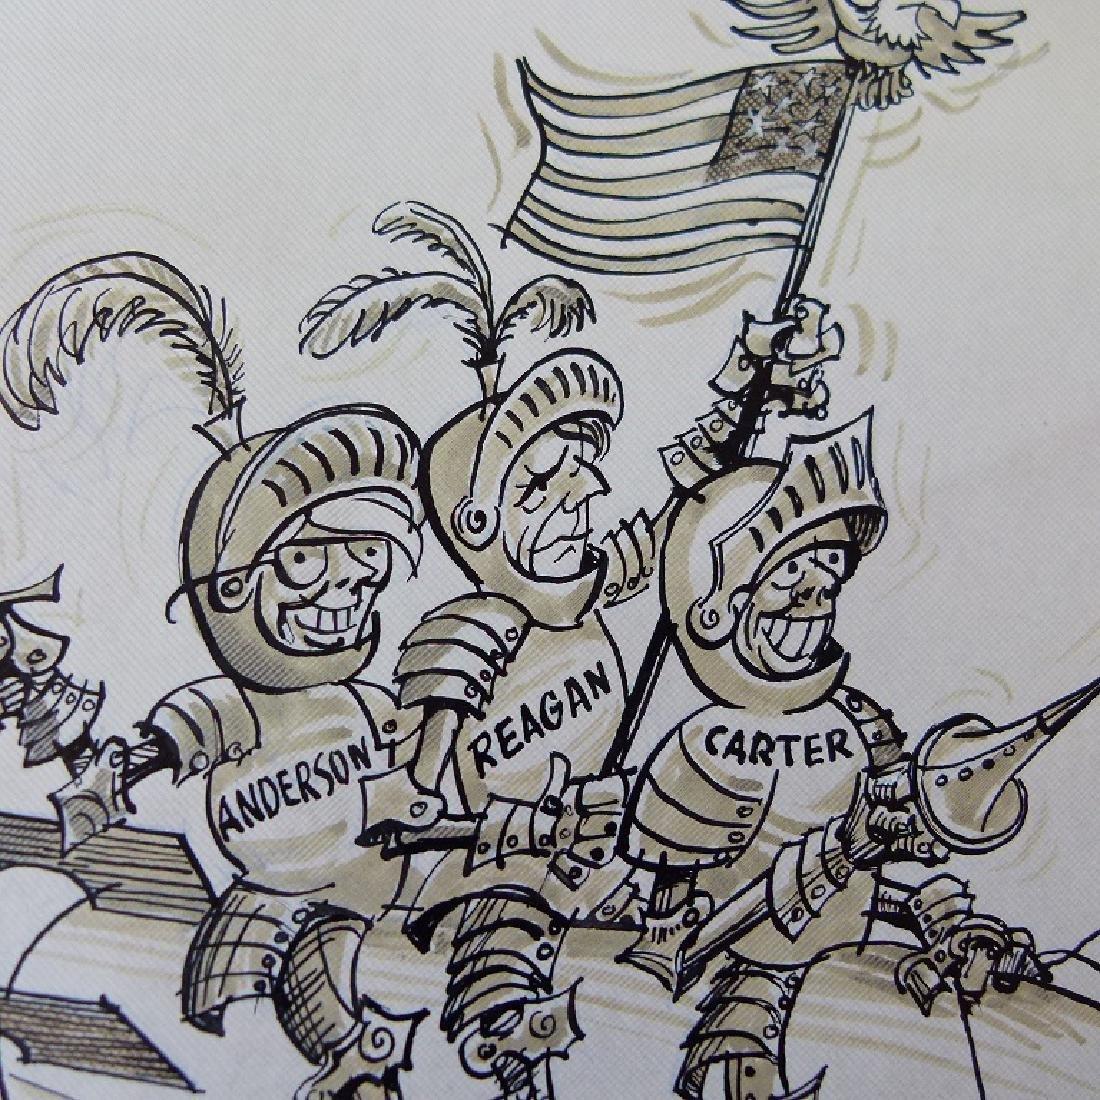 W/C GOUACHE POLITICAL CARTOONS SIGNED KELLER - 11